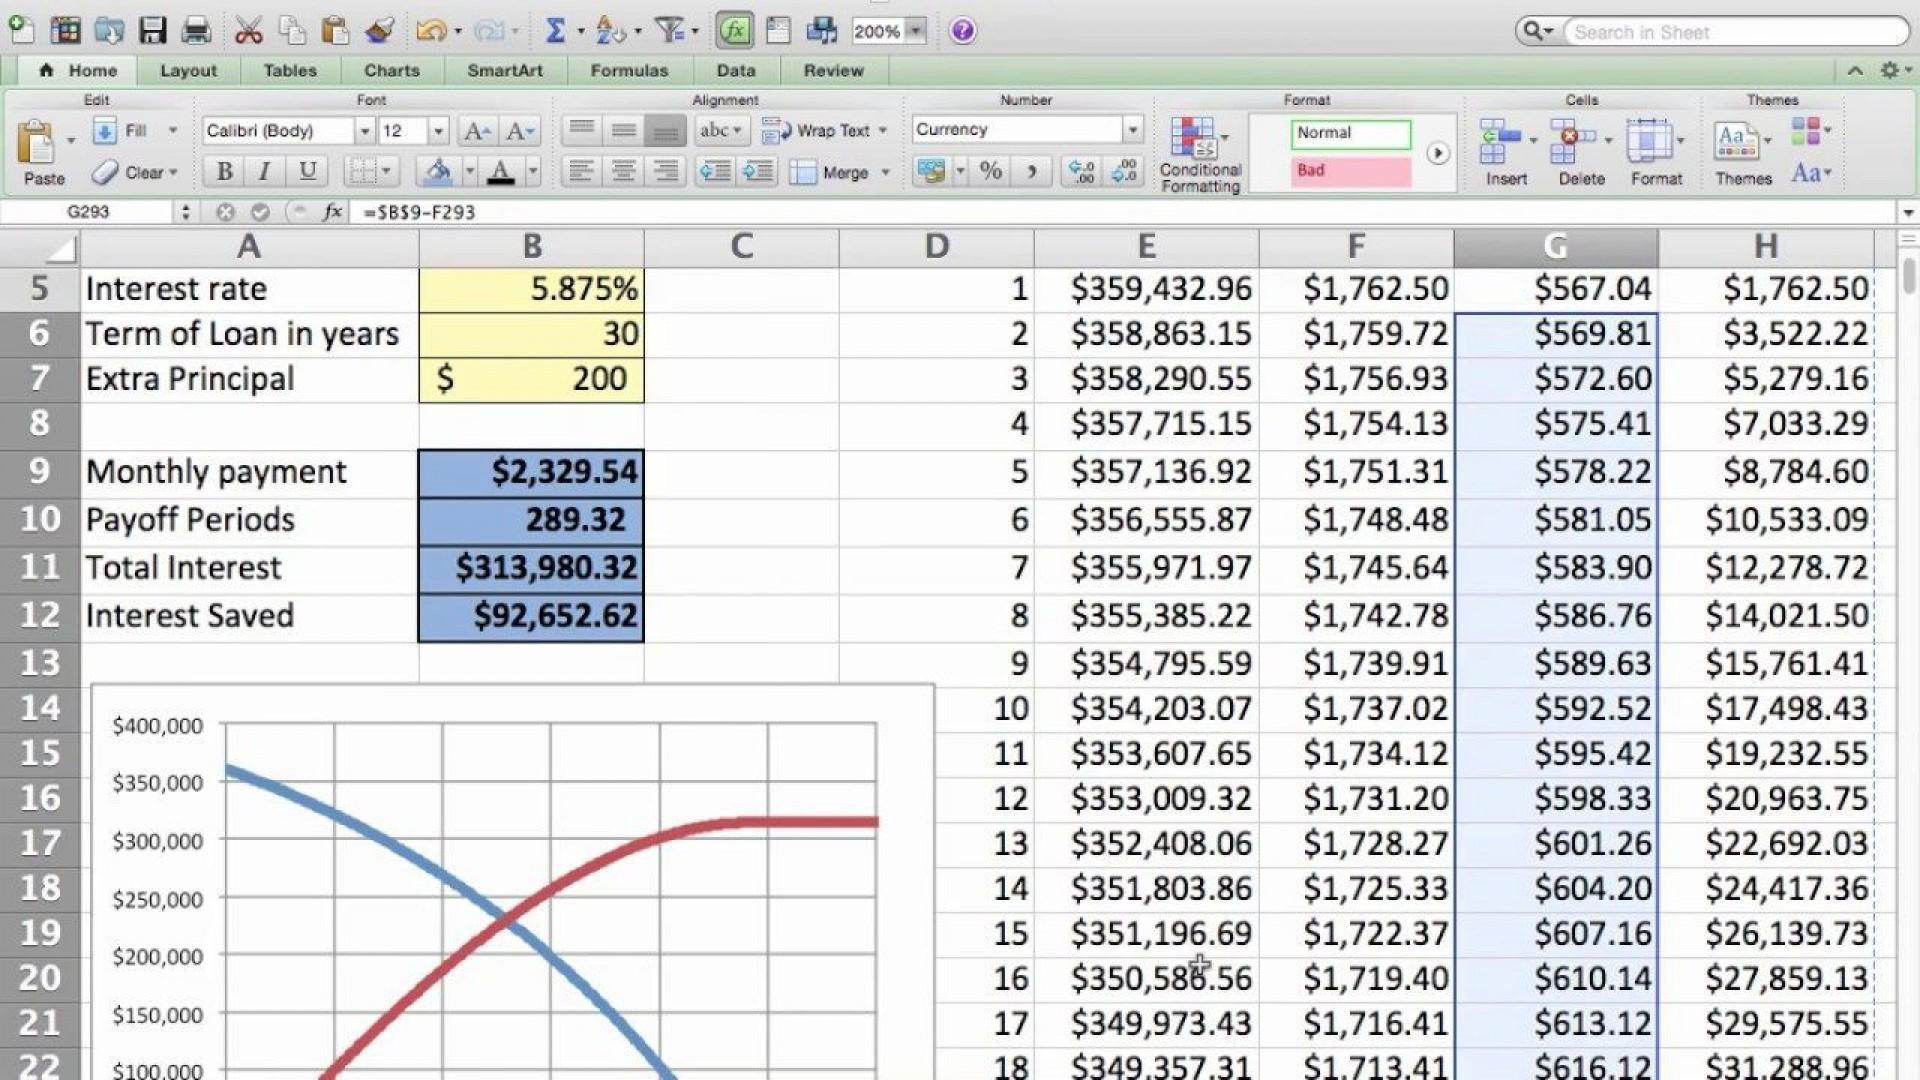 000 Magnificent Loan Amortization Excel Template Idea  Schedule 2010 Free 20071920